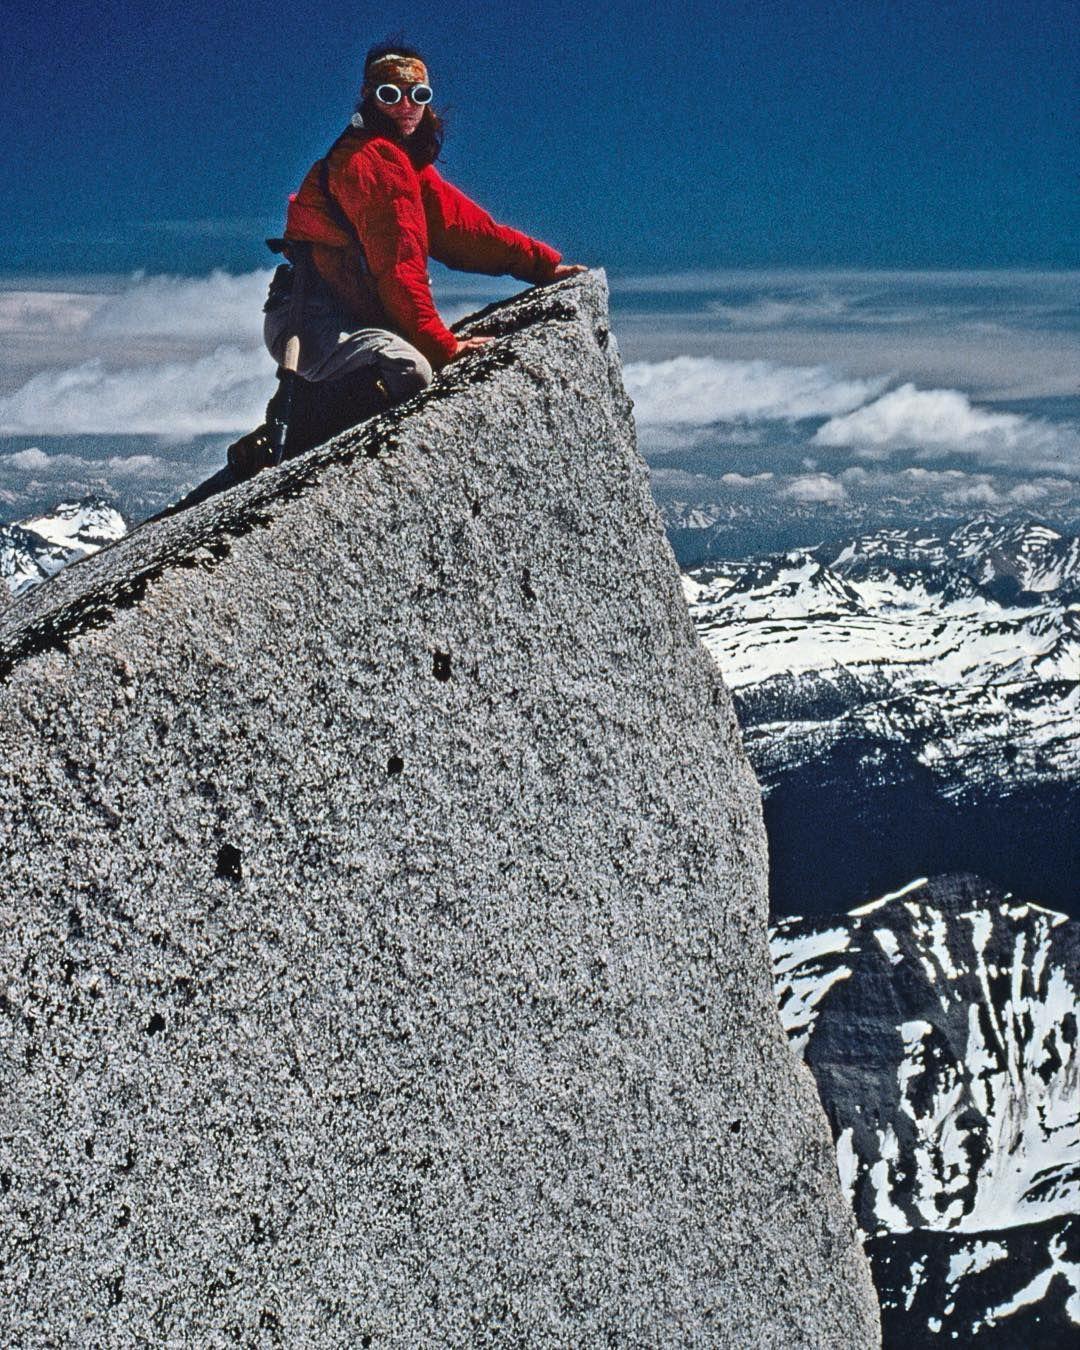 Update from Jon Krakauer: Pam Brown's first summit. Bugaboo Range 1978 #favouriteauthor #jonkrakauer #intothewild